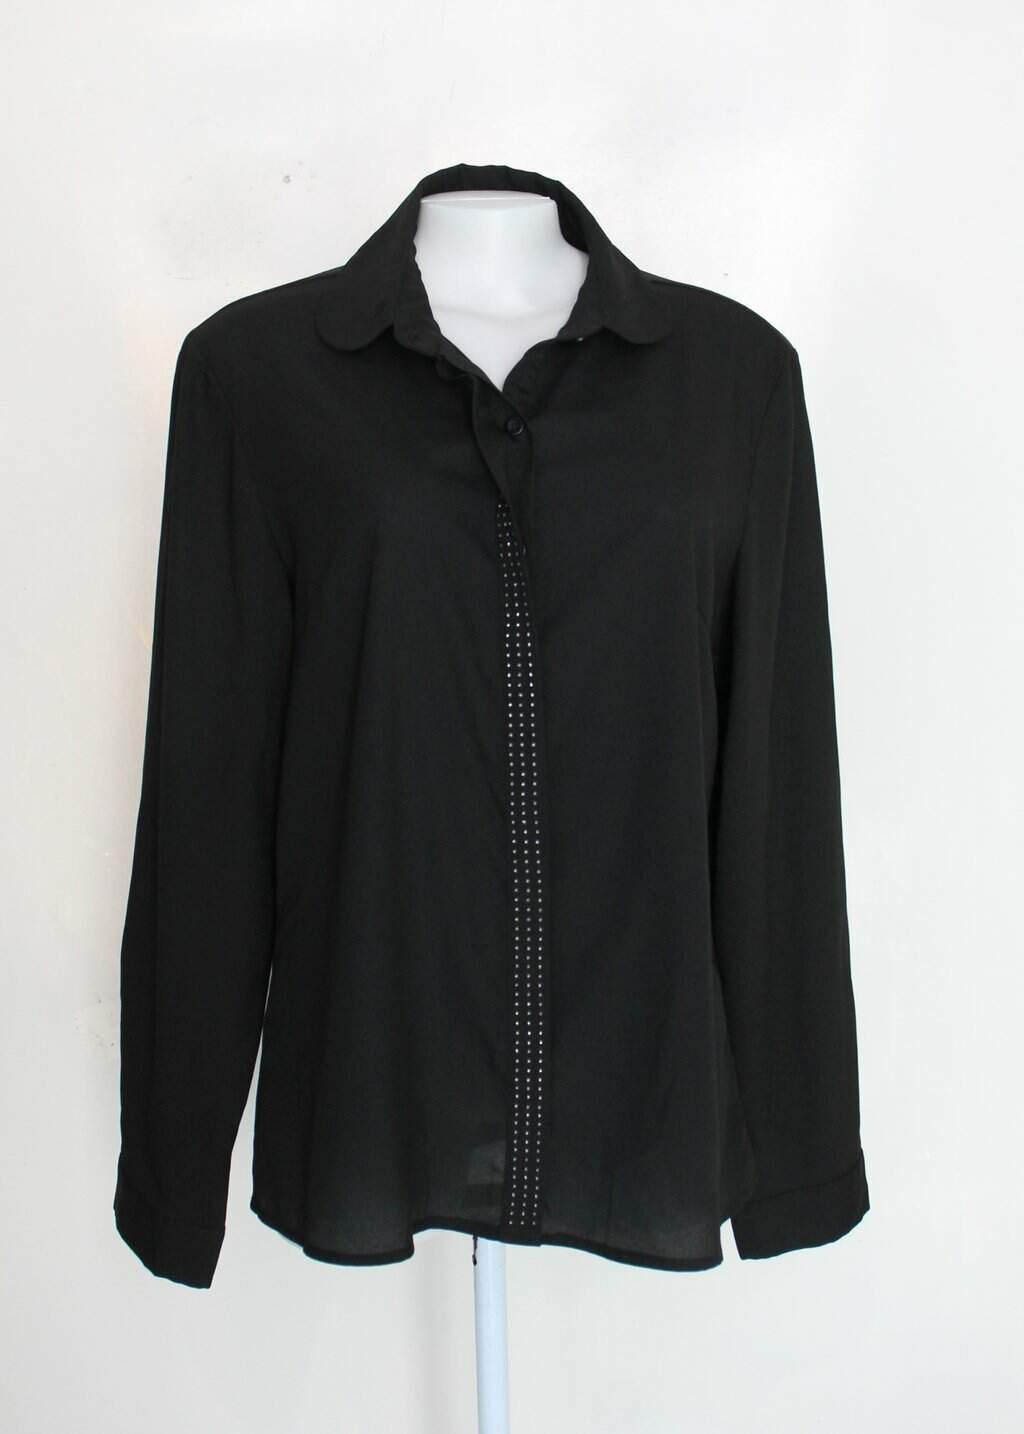 Camisa Beluga Feminina Preto Com Strass